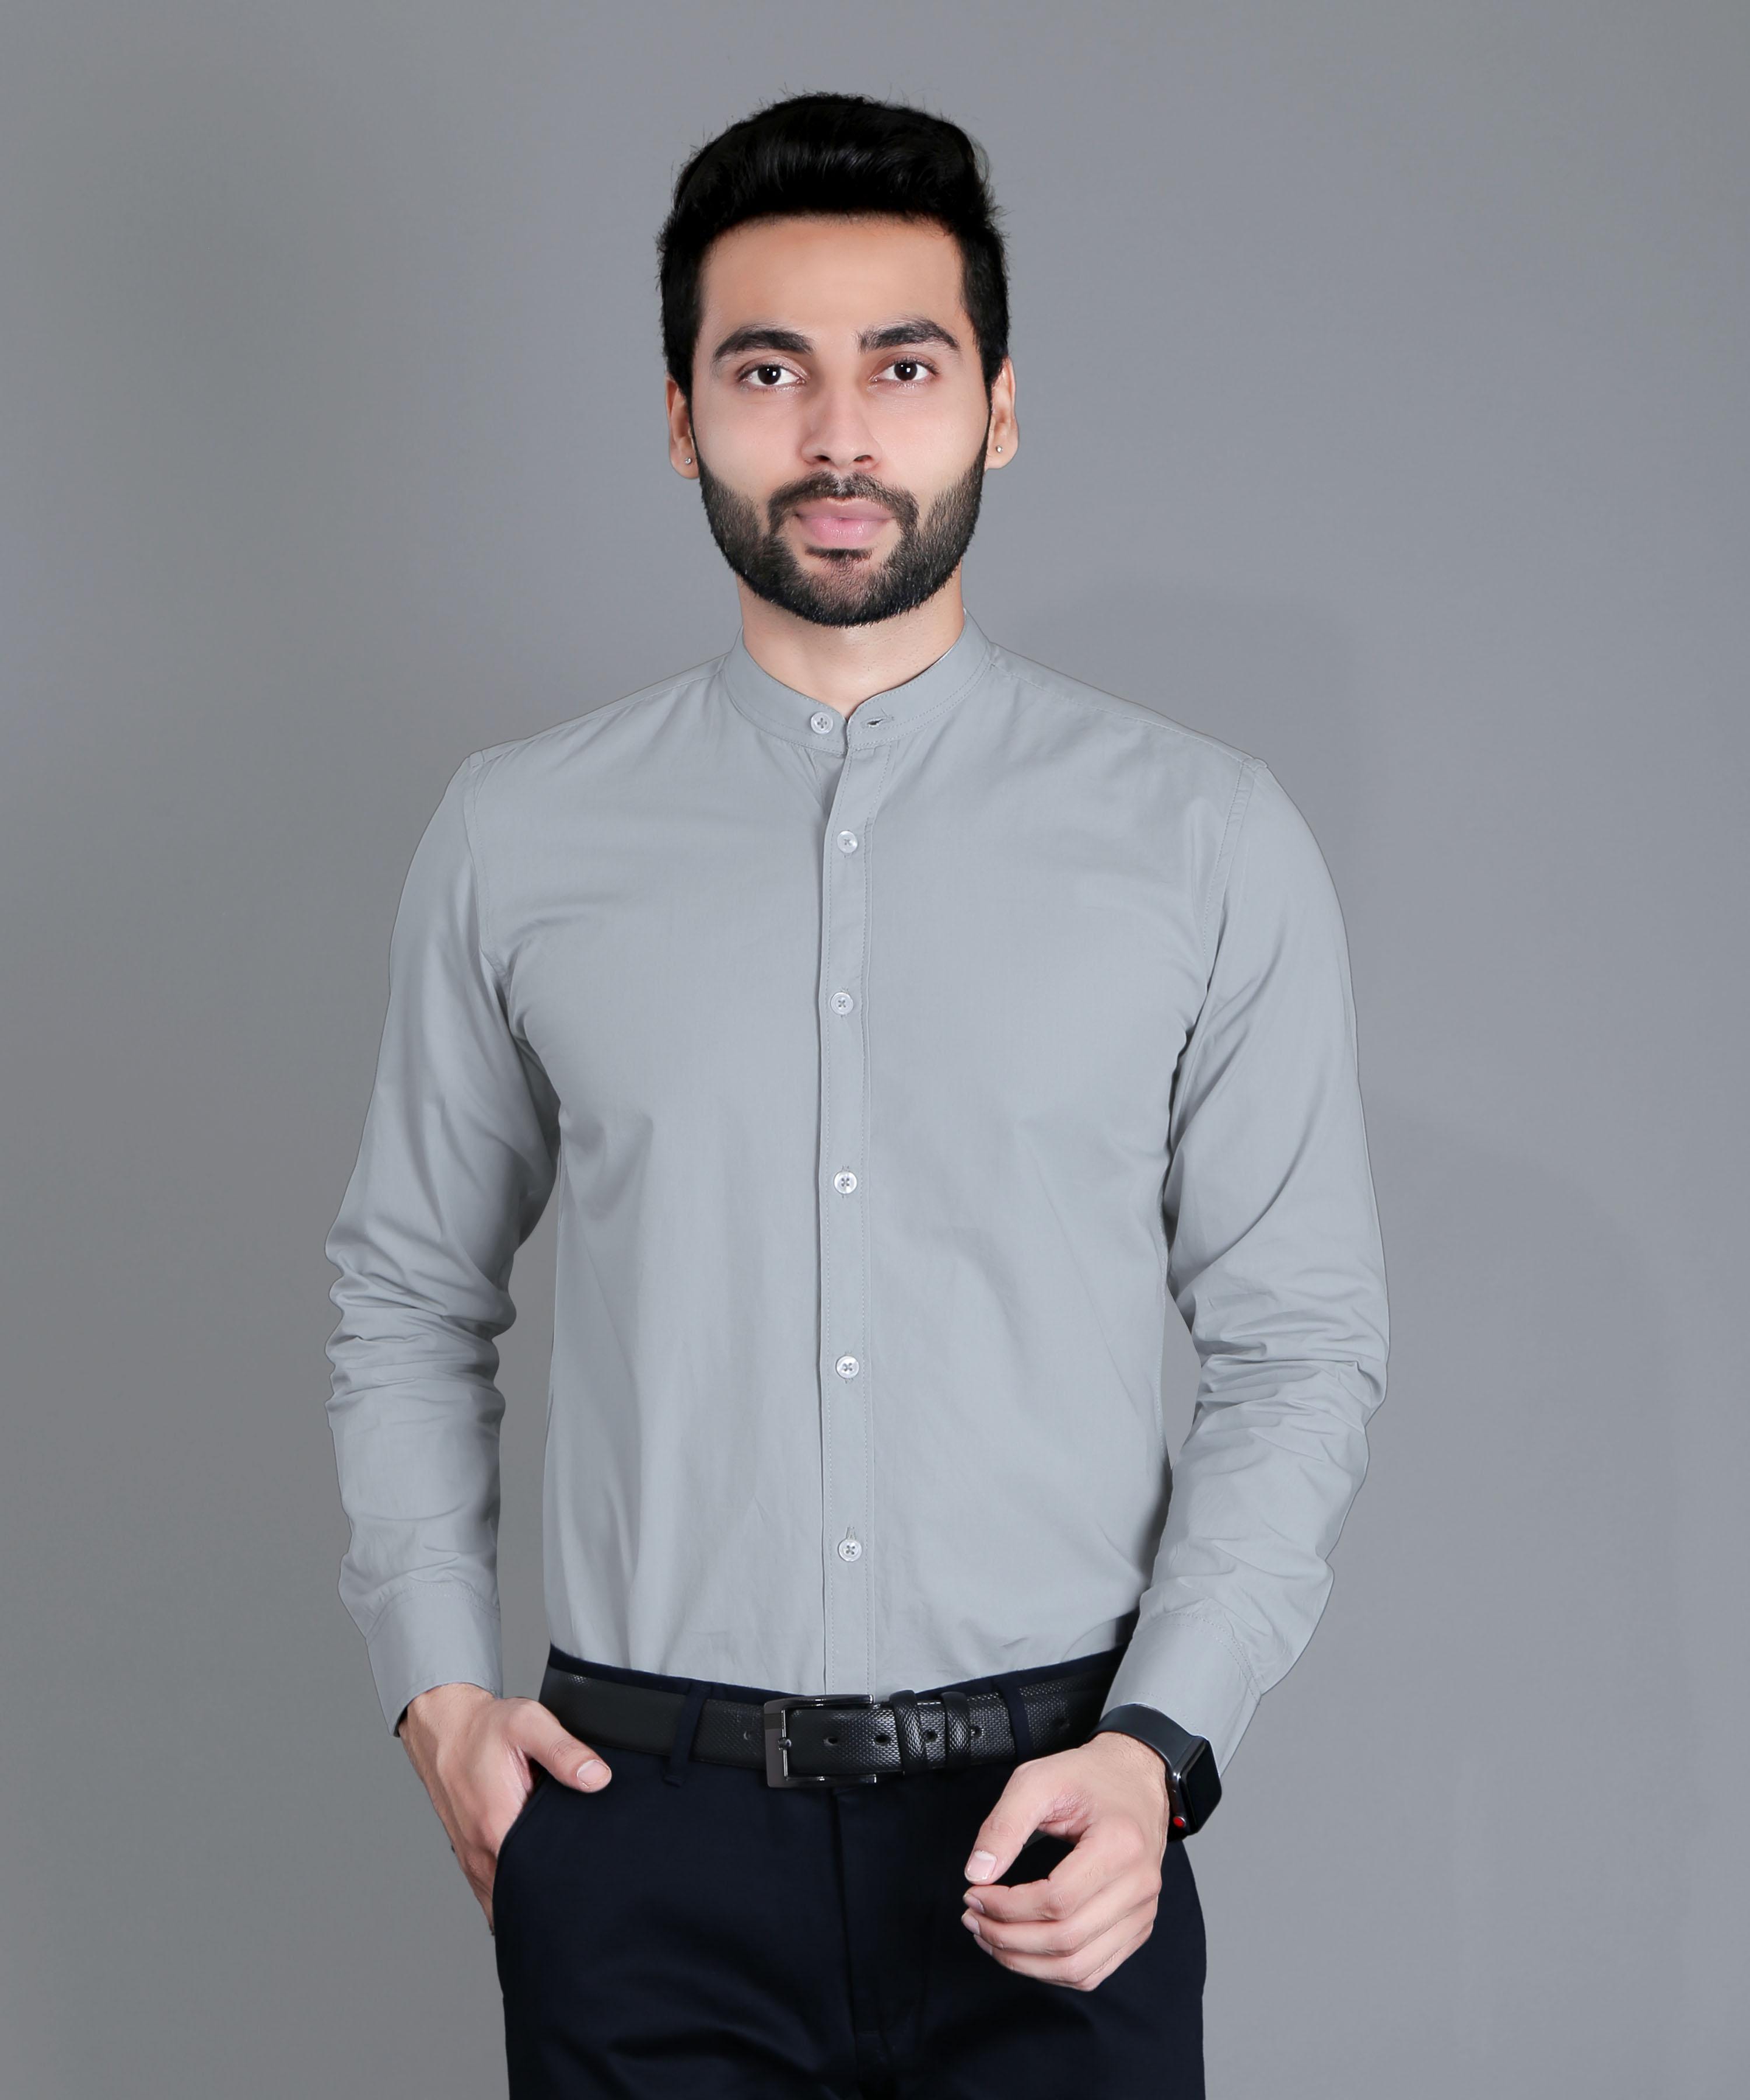 FIFTH ANFOLD Formal Mandrin Collar full Sleev/Long Sleev Cement Grey Pure Cotton Plain Solid Men Shirt